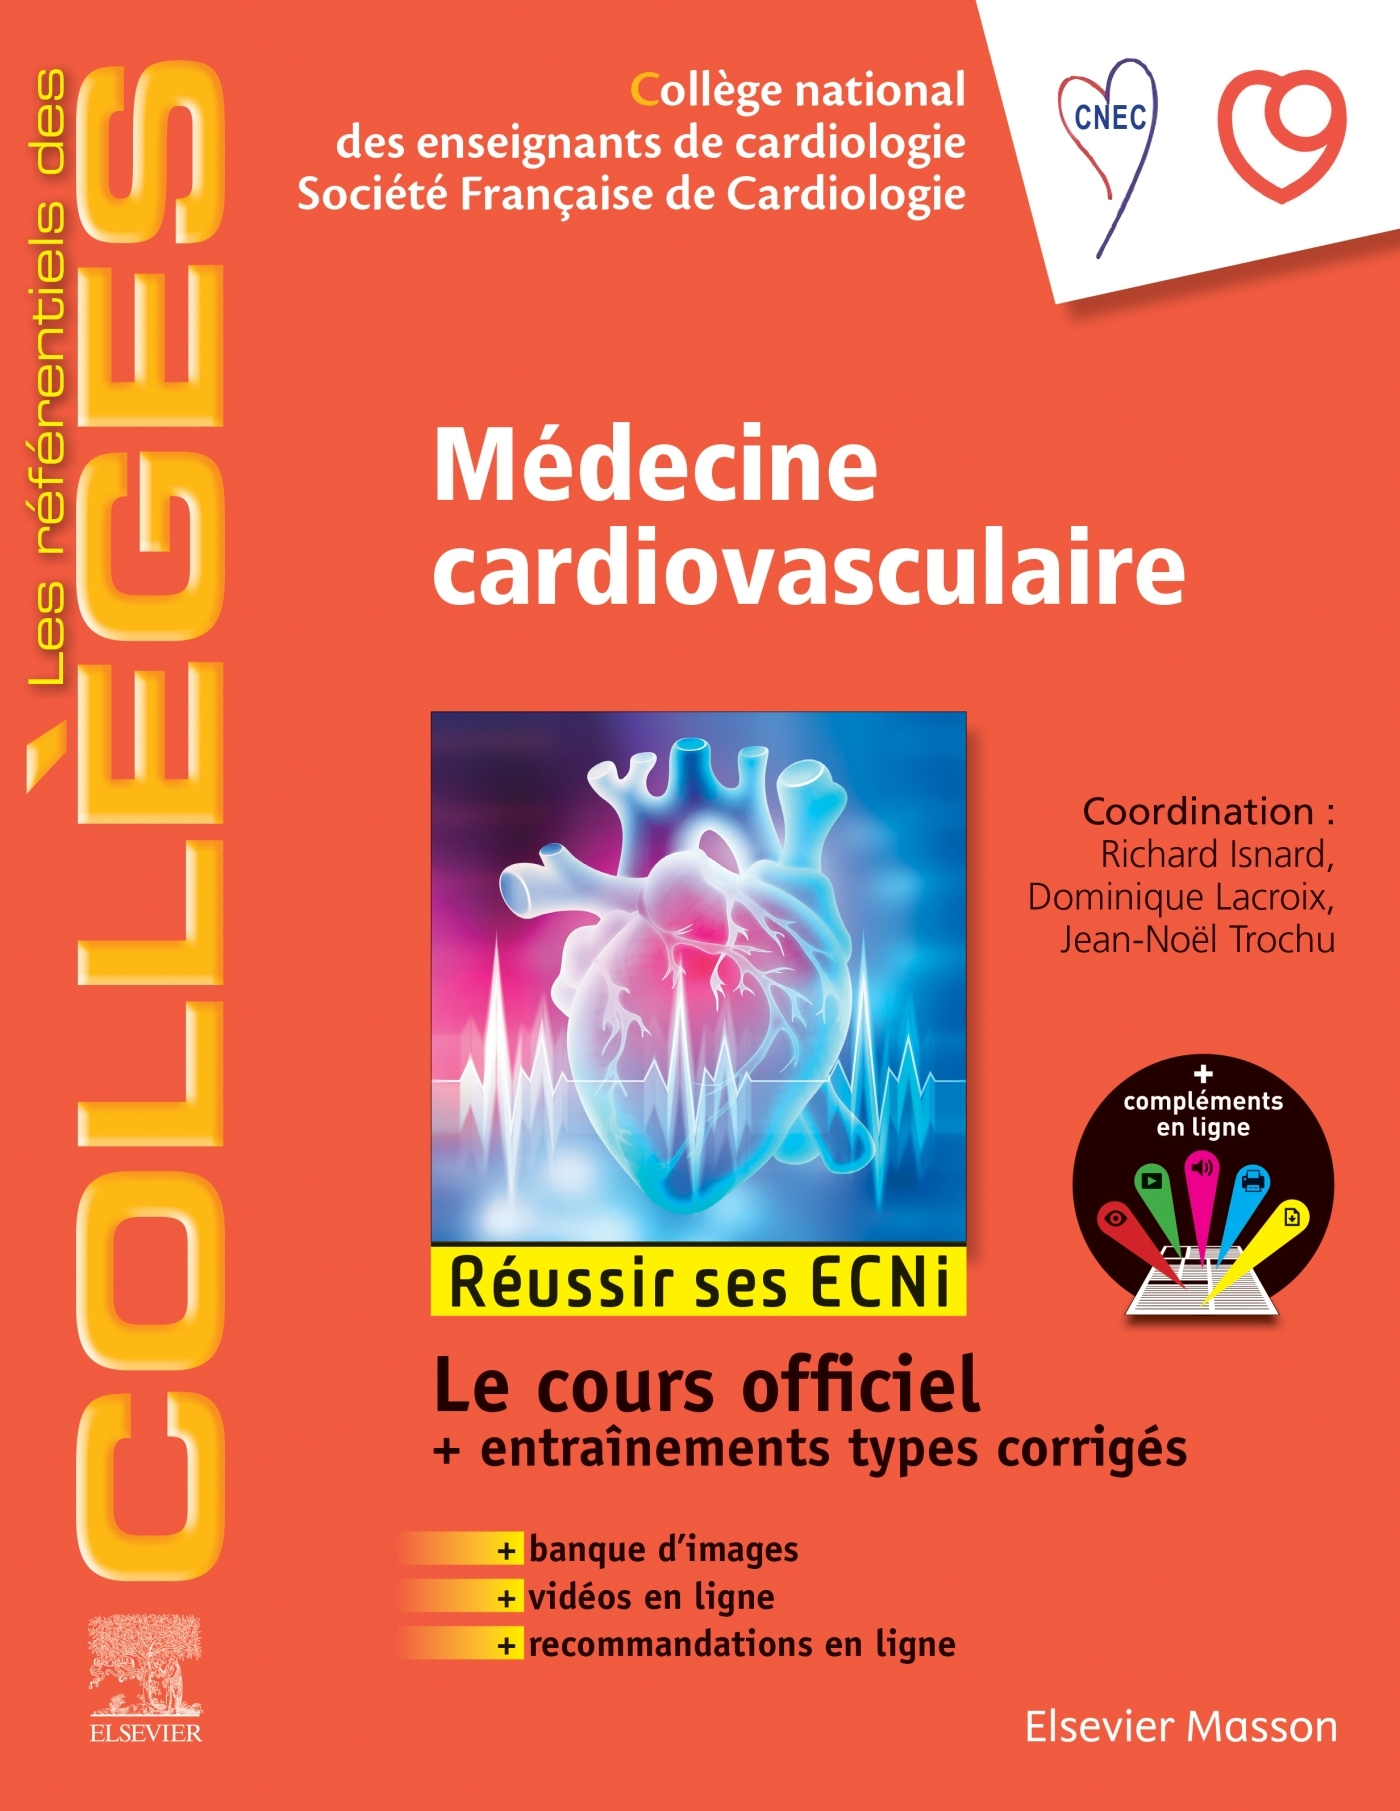 MEDECINE CARDIO-VASCULAIRE - REUSSIR LES ECNI